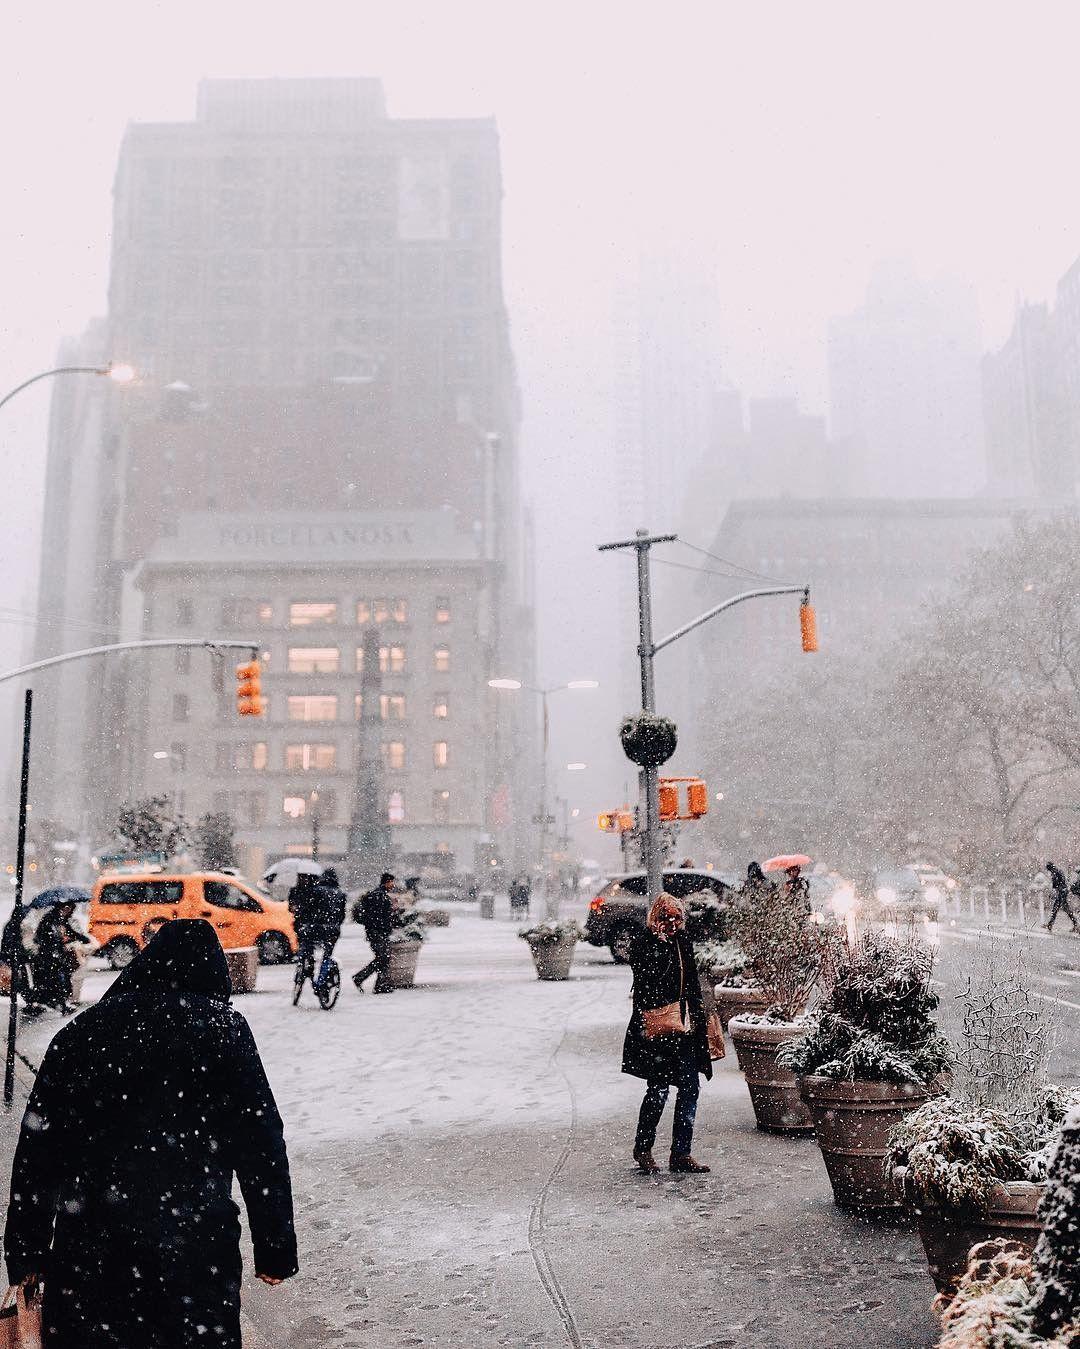 Pin By Cristina Brito On Gotham City New York City Manhattan New York Christmas New York Snow